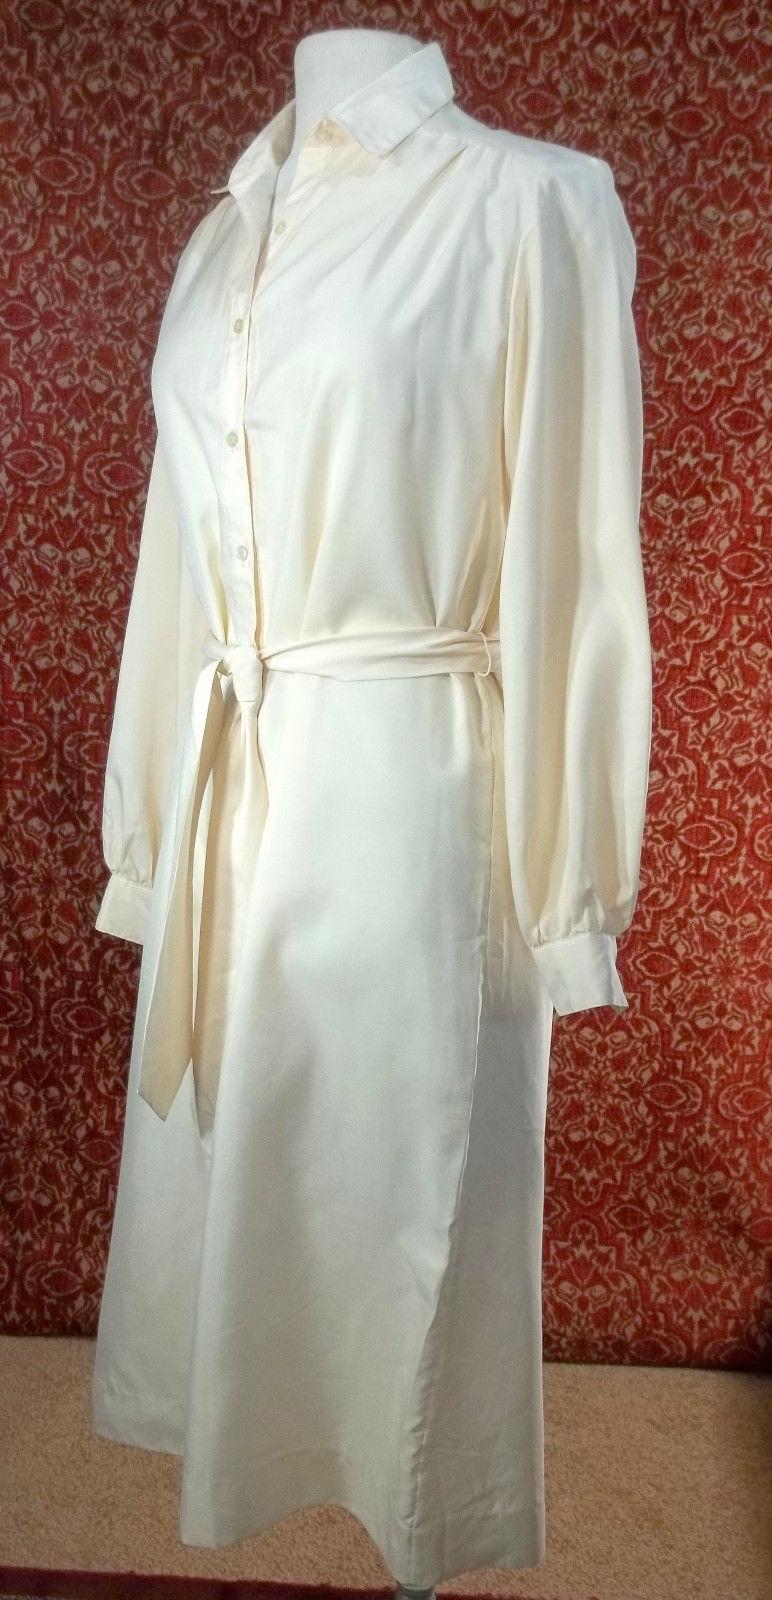 THE LADY MANHATTAN DRESS CO VINTAGE 60s Ivory polyester dress 10 (T1705B8G)